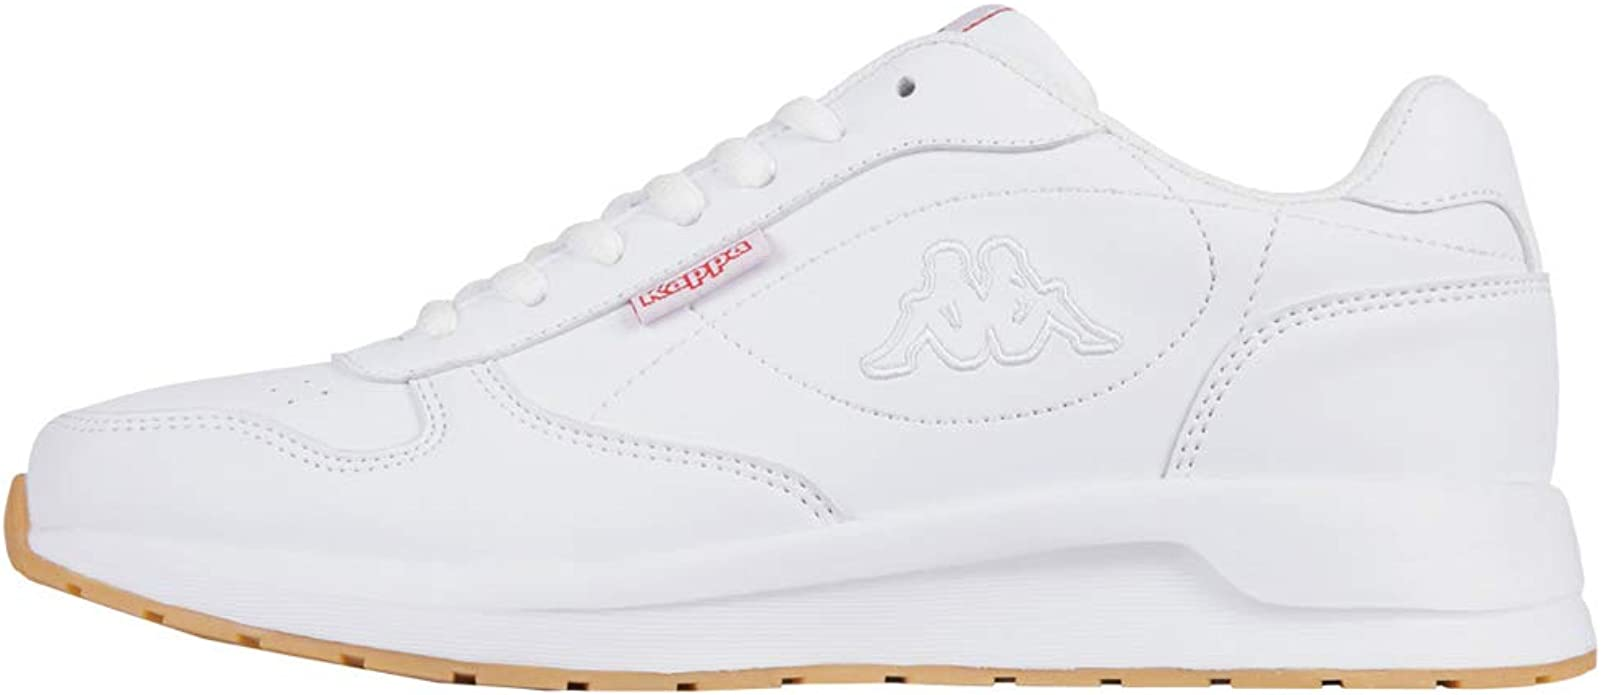 Kappa Men's Low-Top Sneakers: Shoes